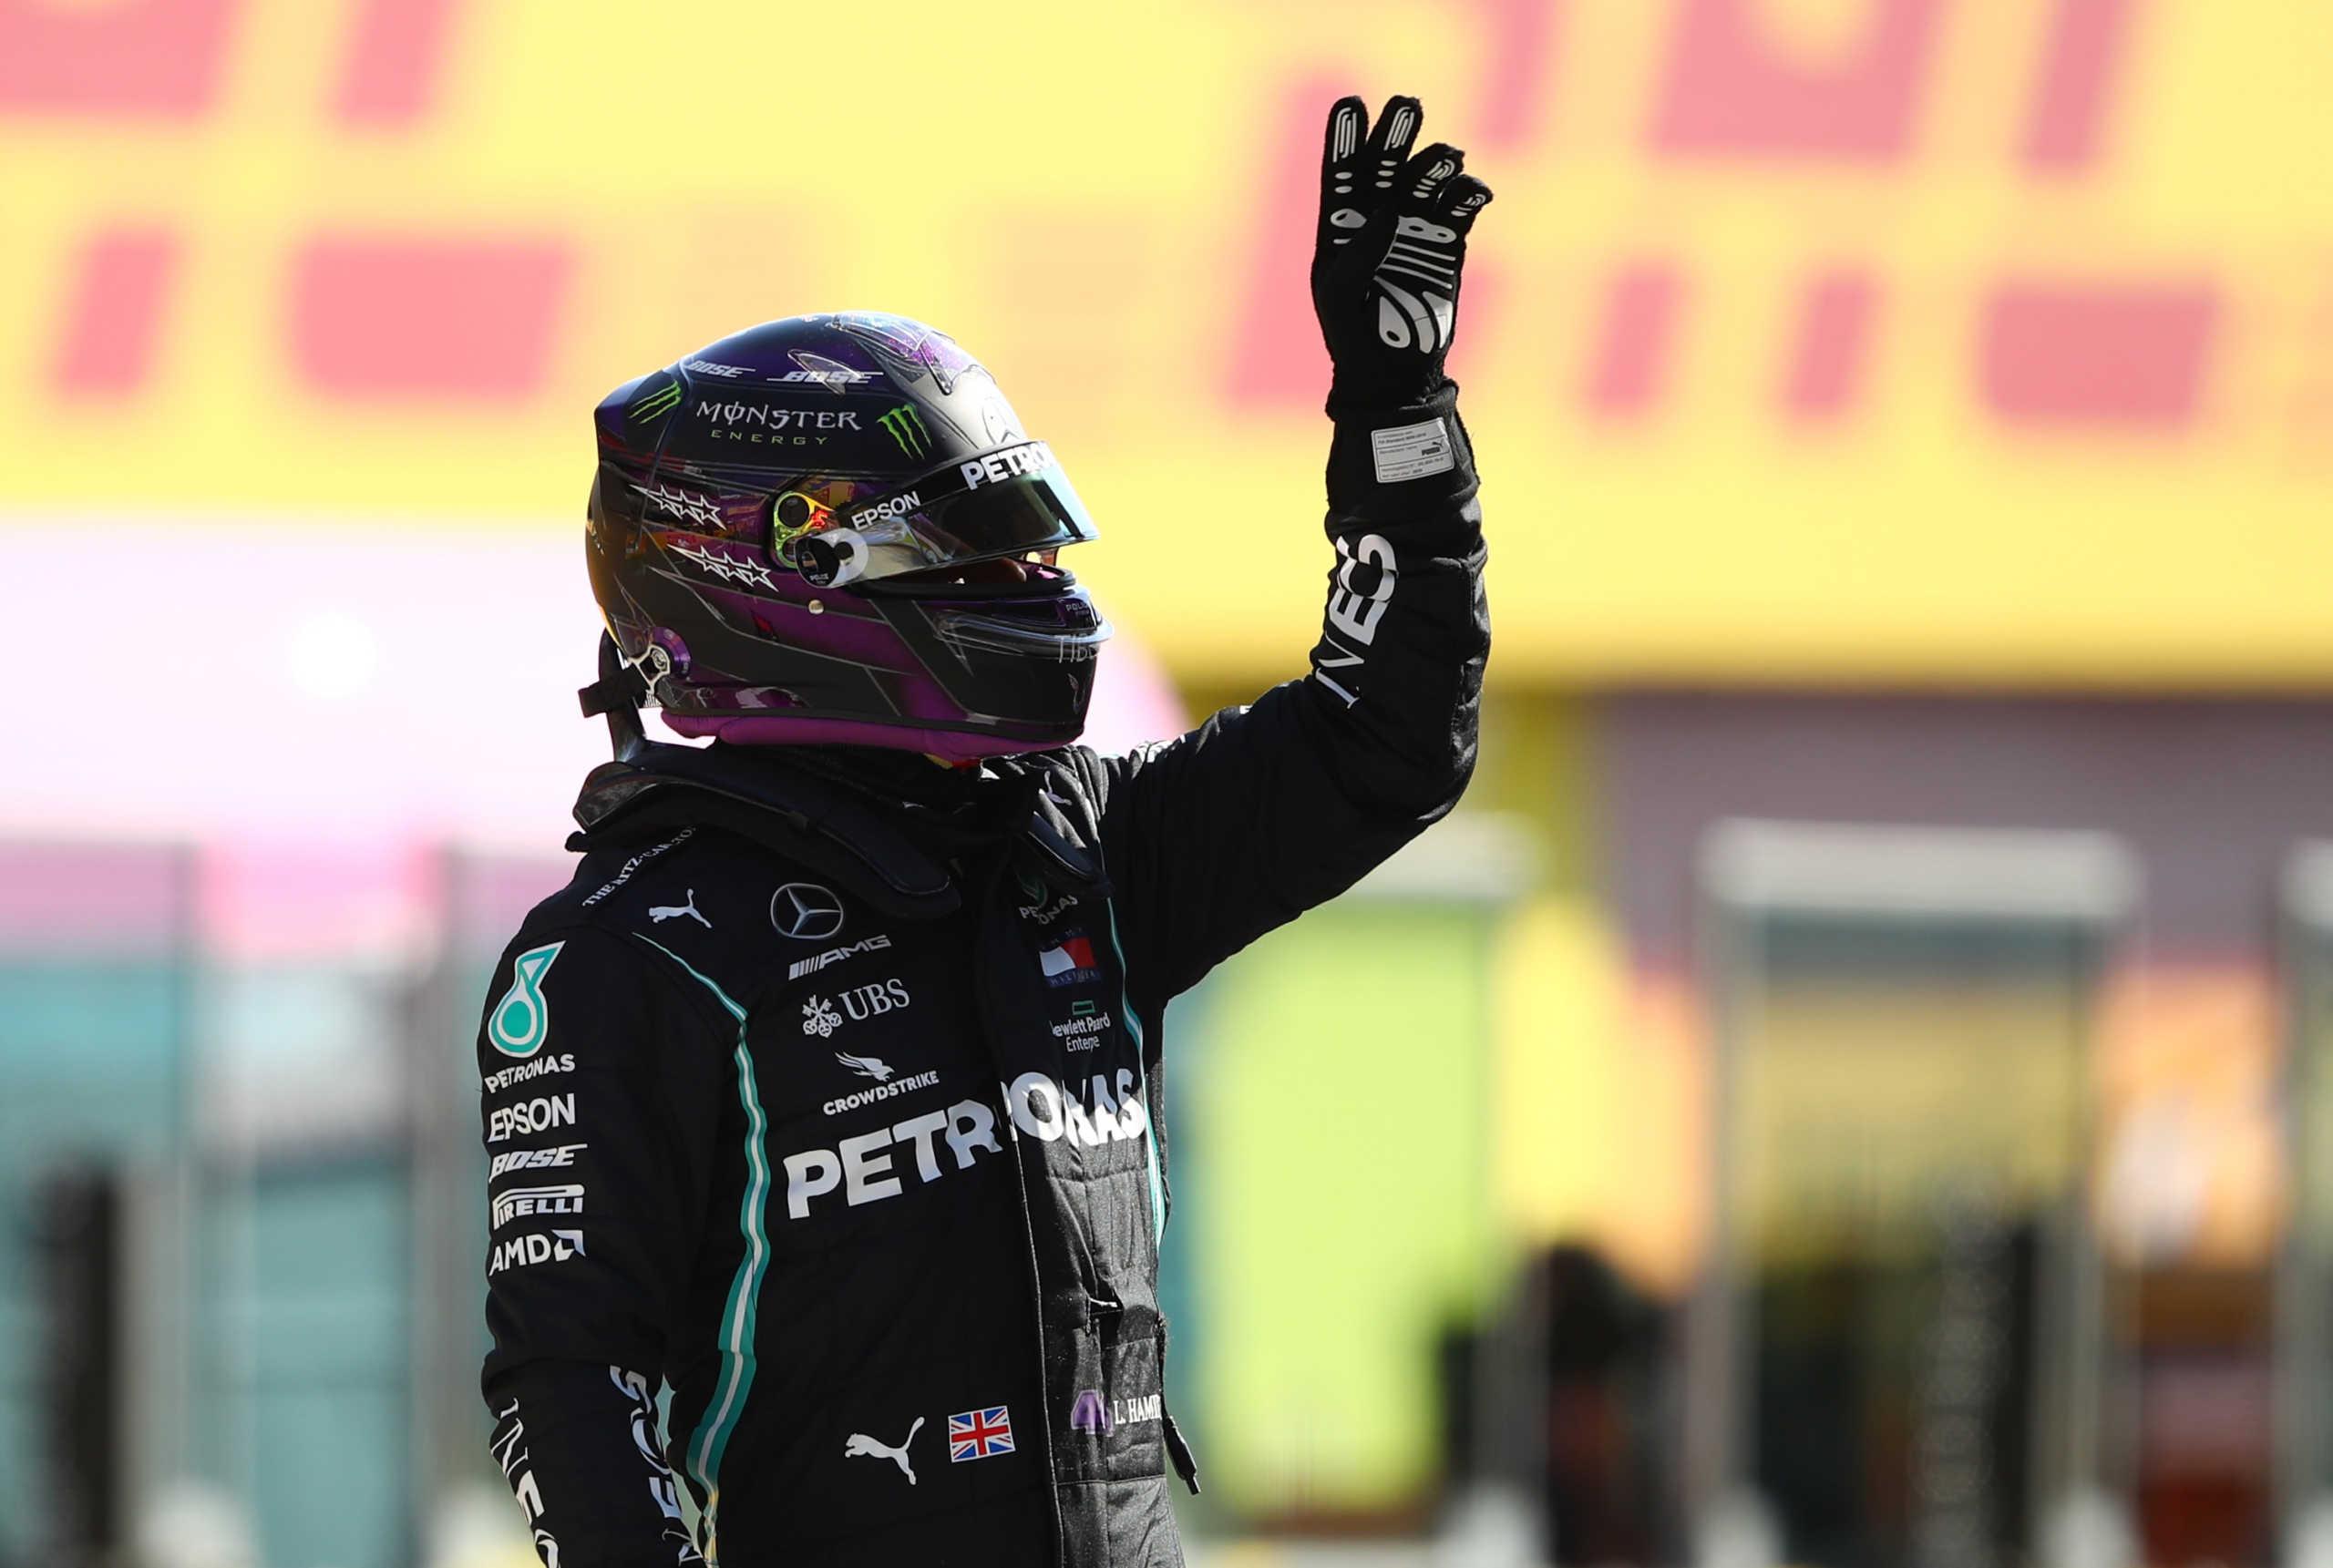 Formula 1: Στον Χάμιλτον η pole position! 1-2 η Mercedes